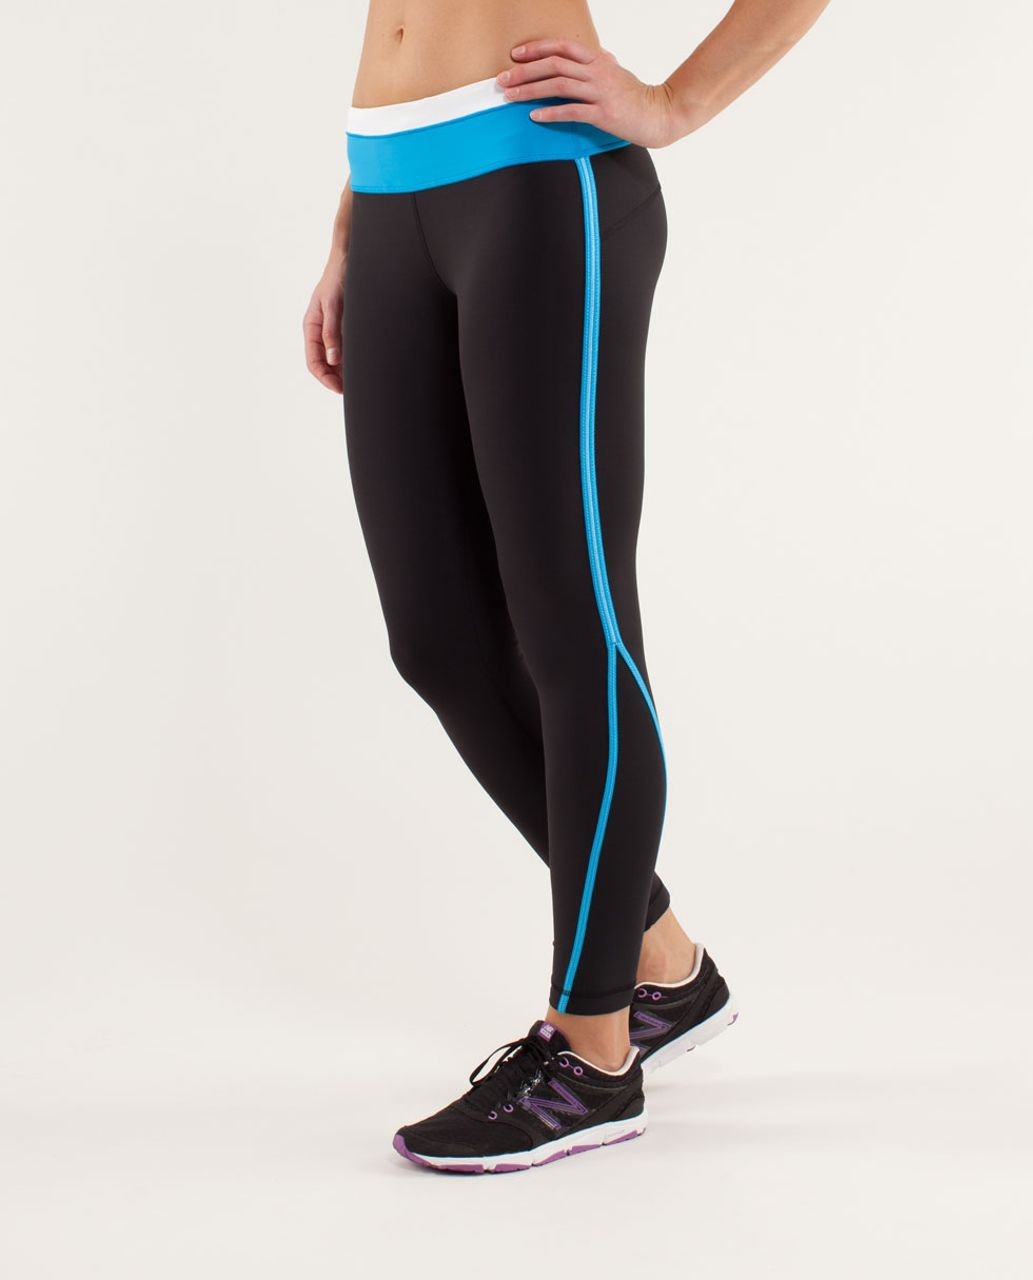 Lululemon Run:  Pace Tight - Black / Beach Blanket Blue / White